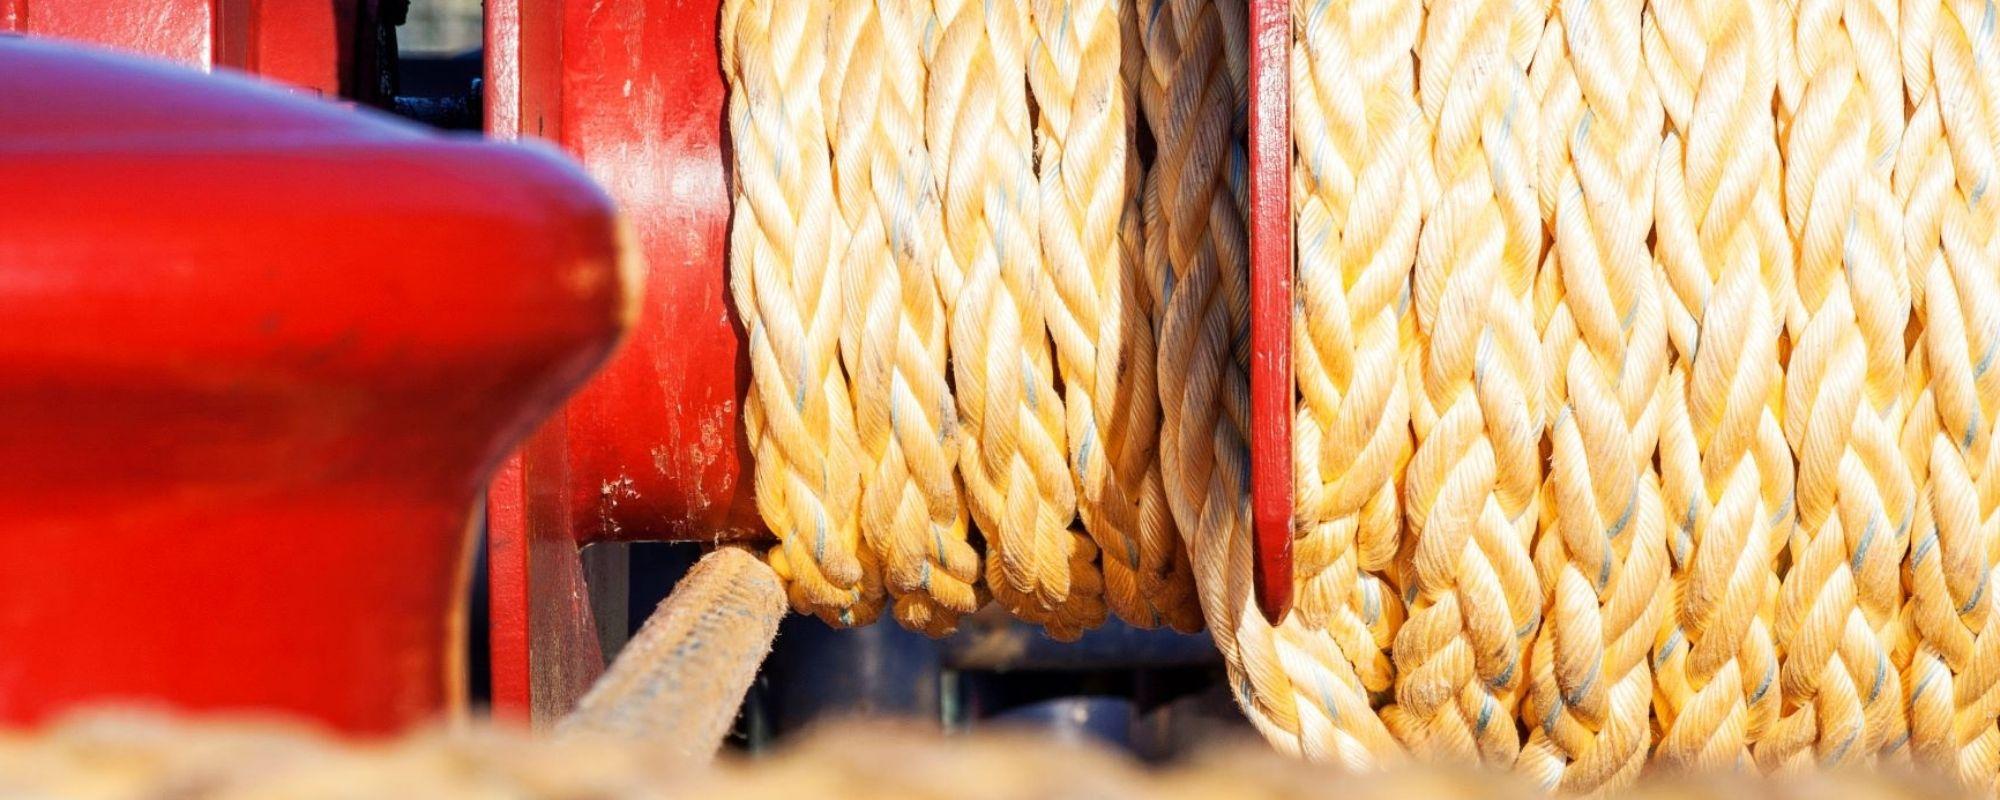 Rope Supplies & Mooring Fabrication